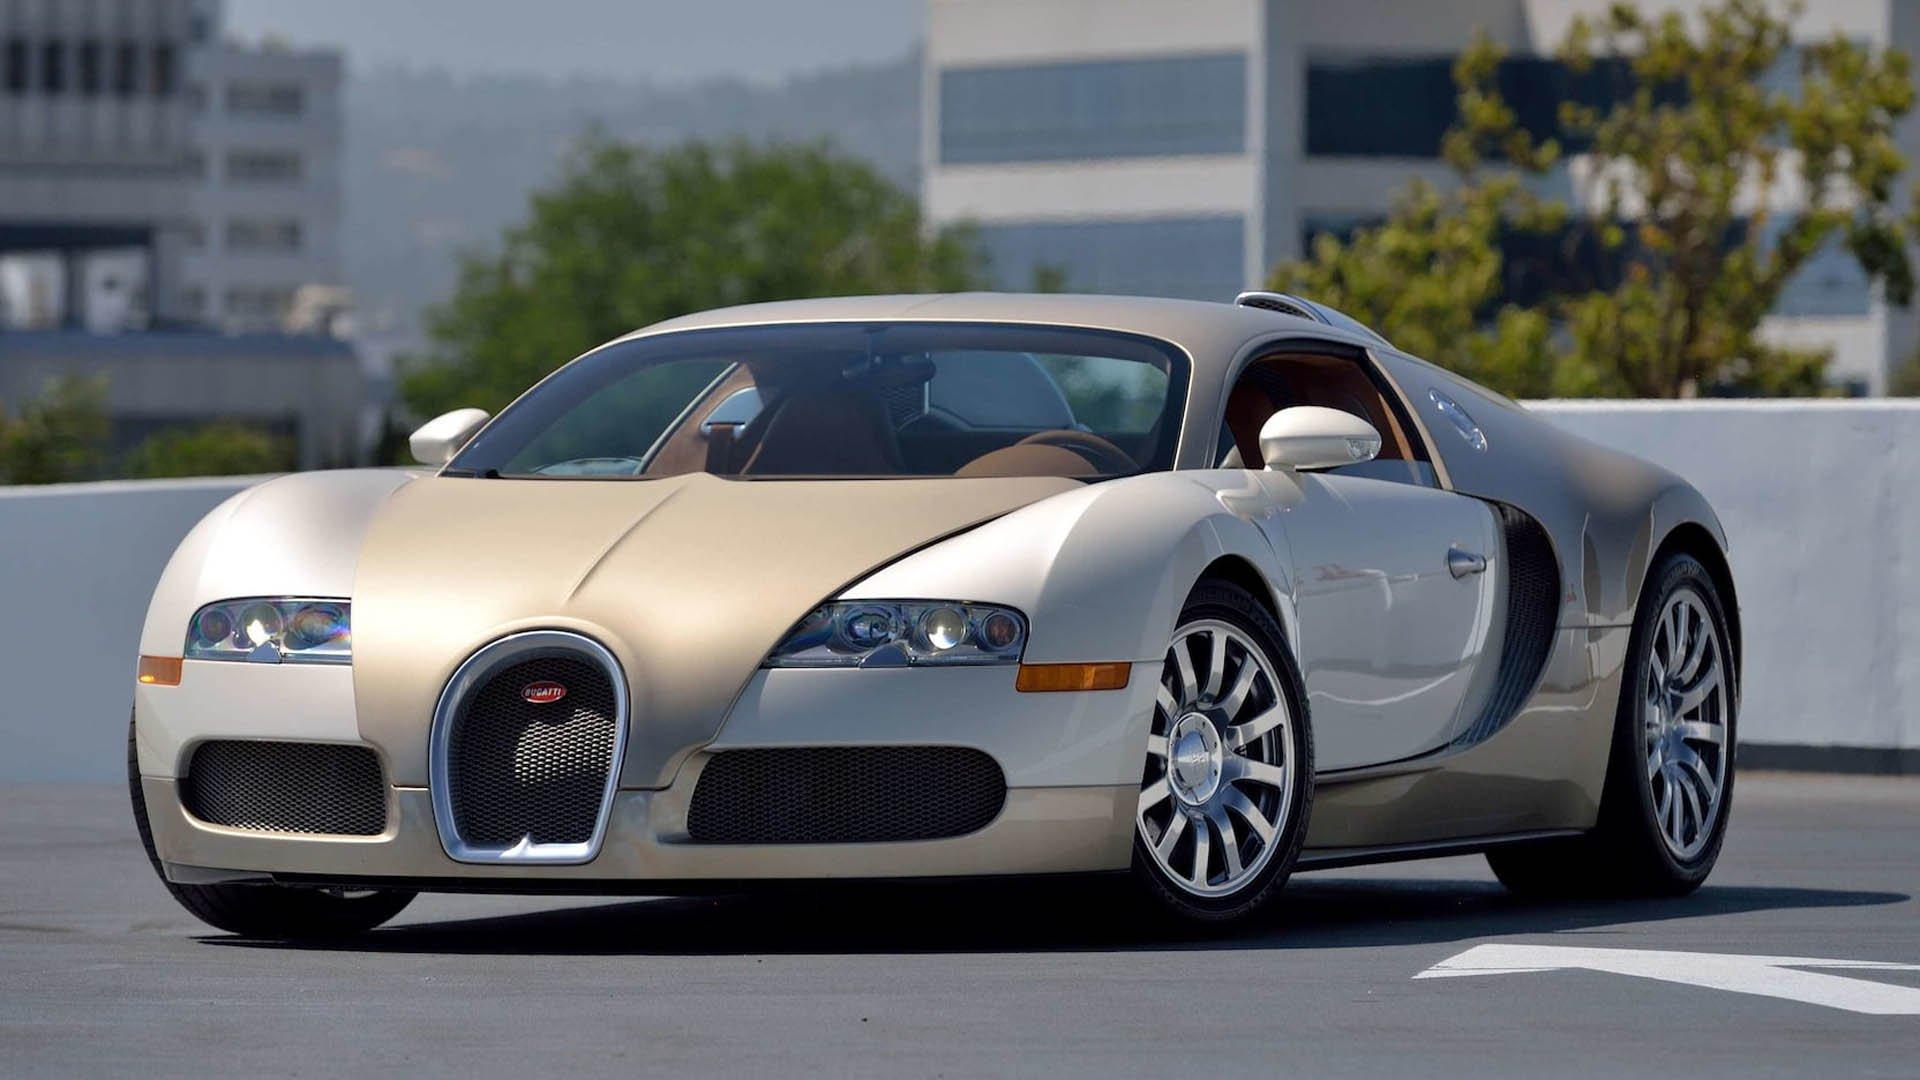 53eeb2b4-bugatti-veyrons-mecum-monterey-09